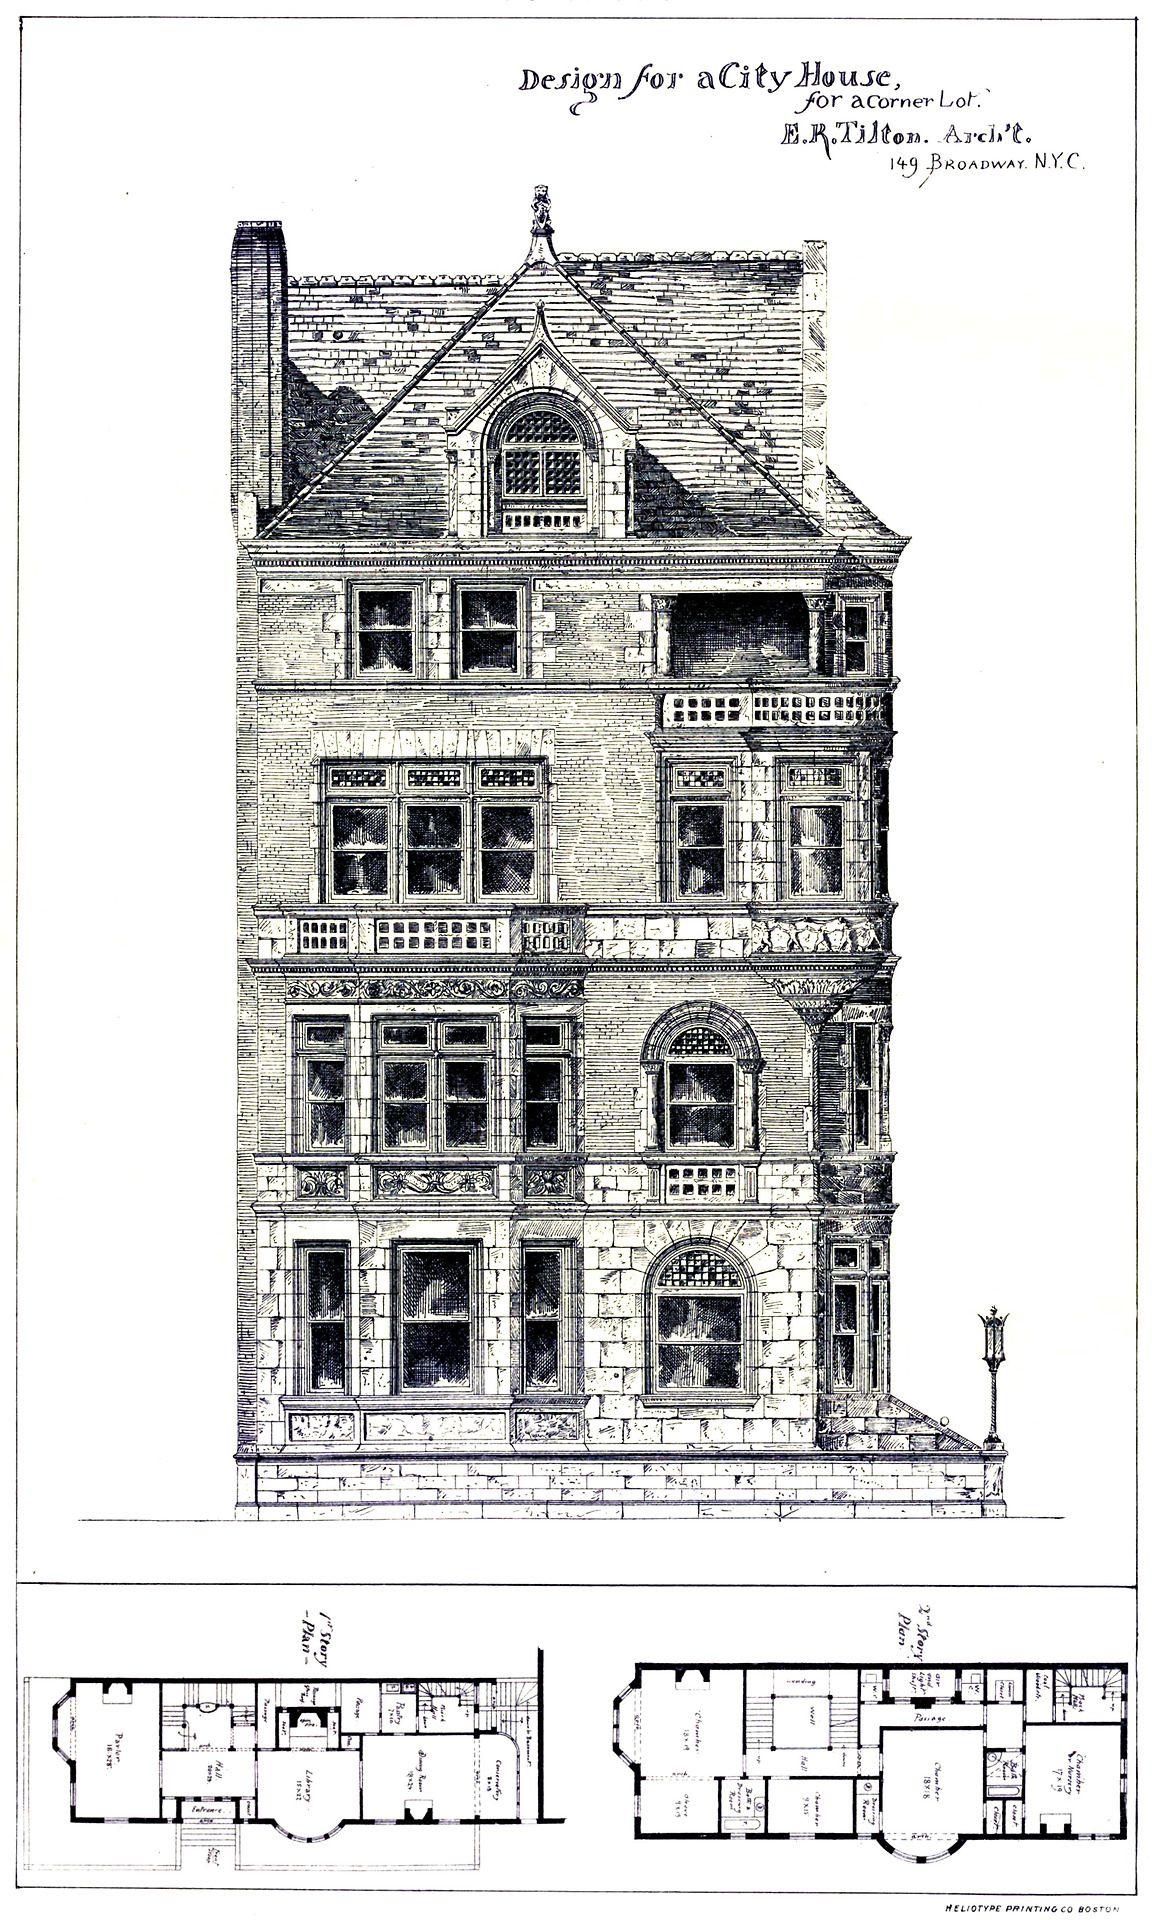 Pin By Liz Shann On Domestic Architecture Pinterest Architektur